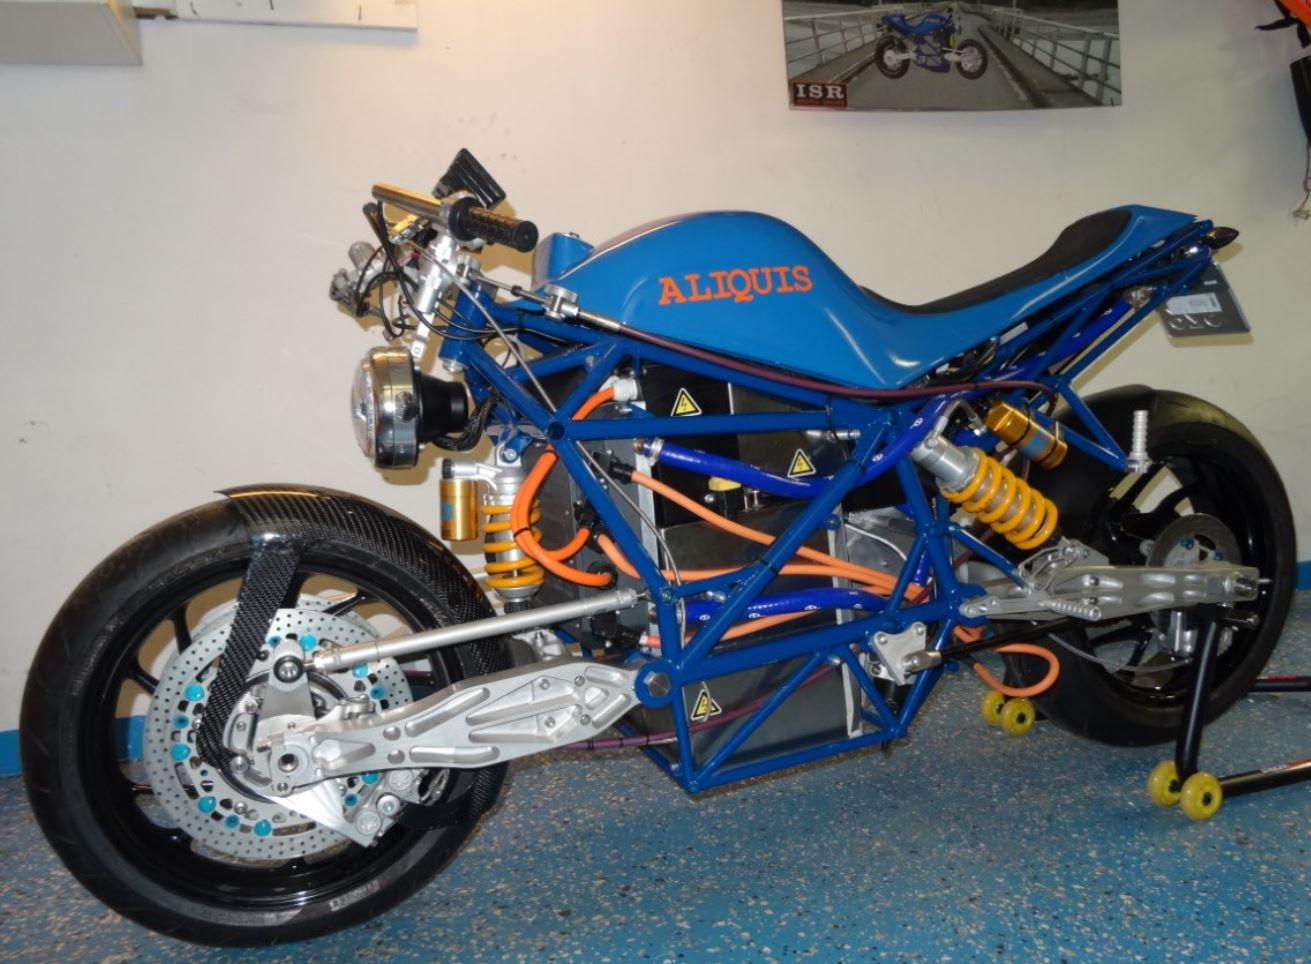 Electric Superbike, Electric Motorcycle, Superbike, EV